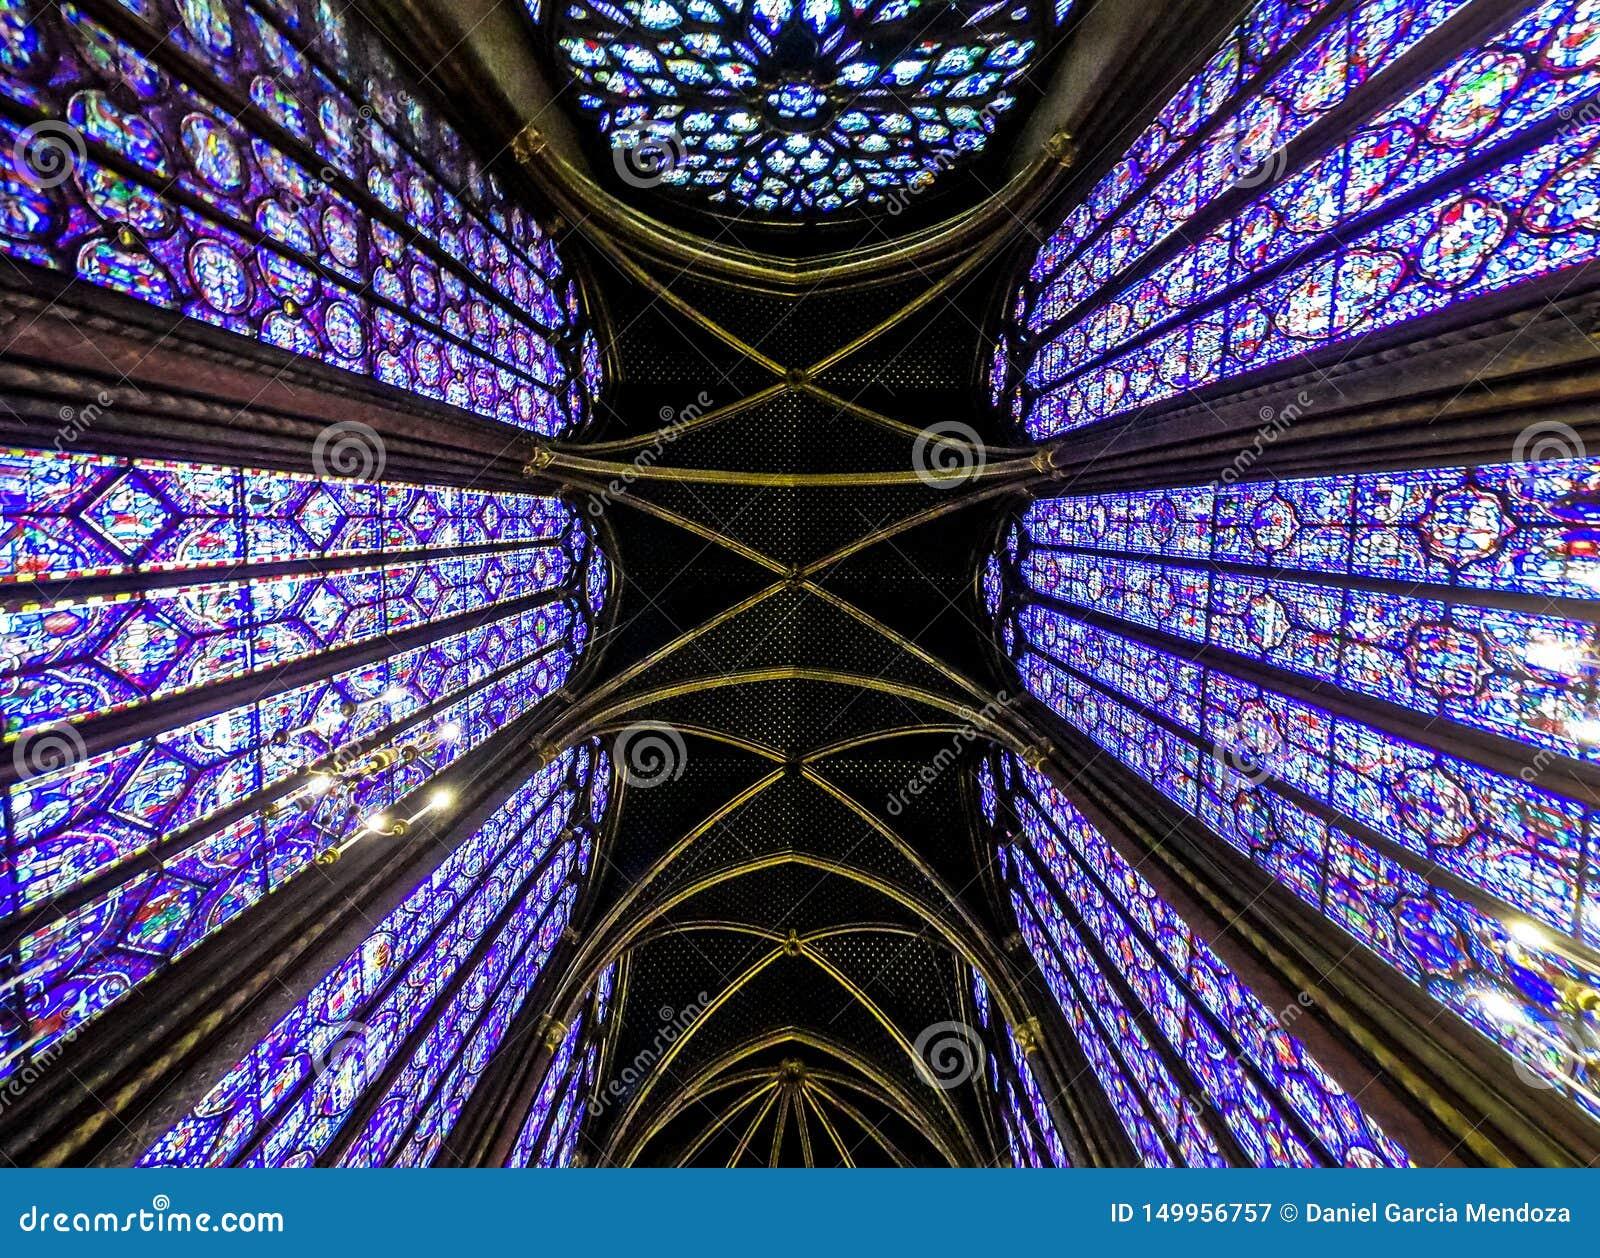 Santo famoso interior Chapelle, detalles del mosaico de cristal hermoso Windows